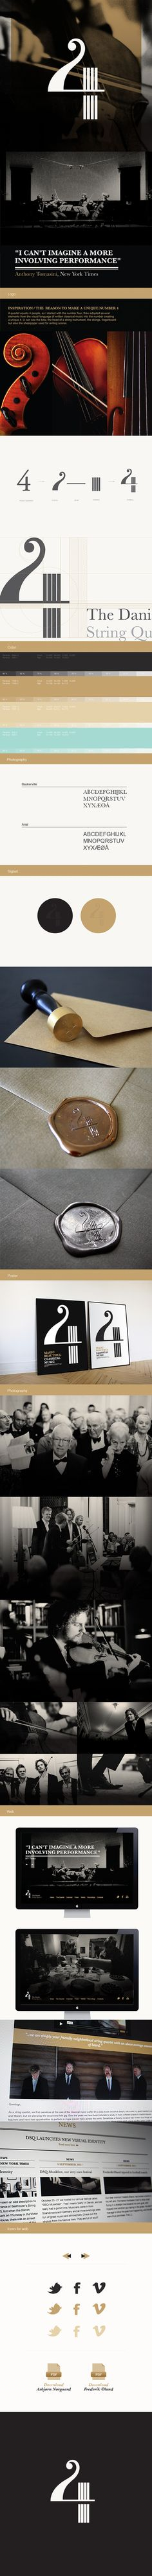 Branding: The Danish String Quartet / Corporate identity by Maibritt Lind Hansen Graphic Design Branding, Corporate Design, Corporate Identity, Identity Design, Visual Identity, Typography Design, Packaging Design, Logo Design, Identity Branding